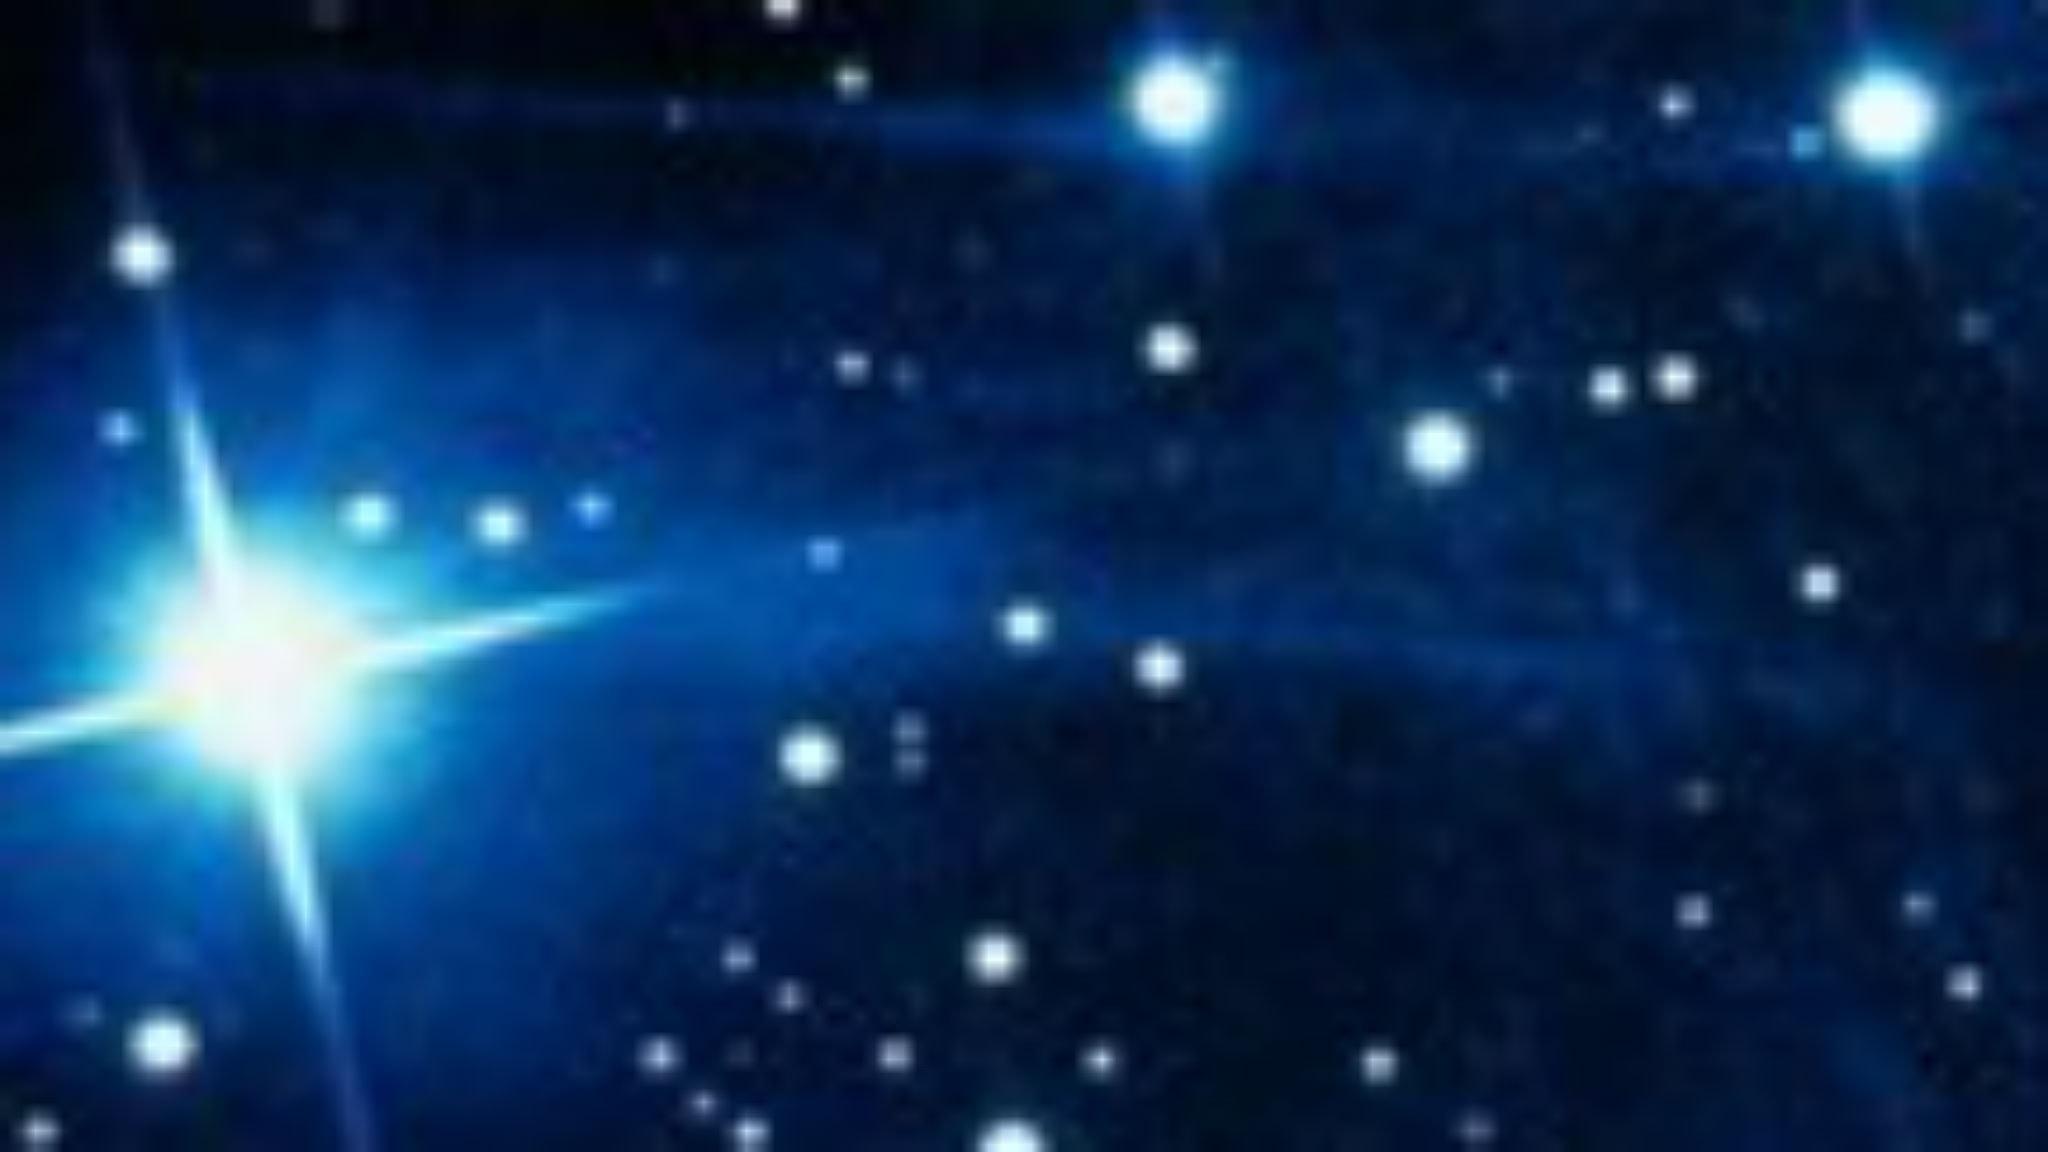 Finns det liv i universum?